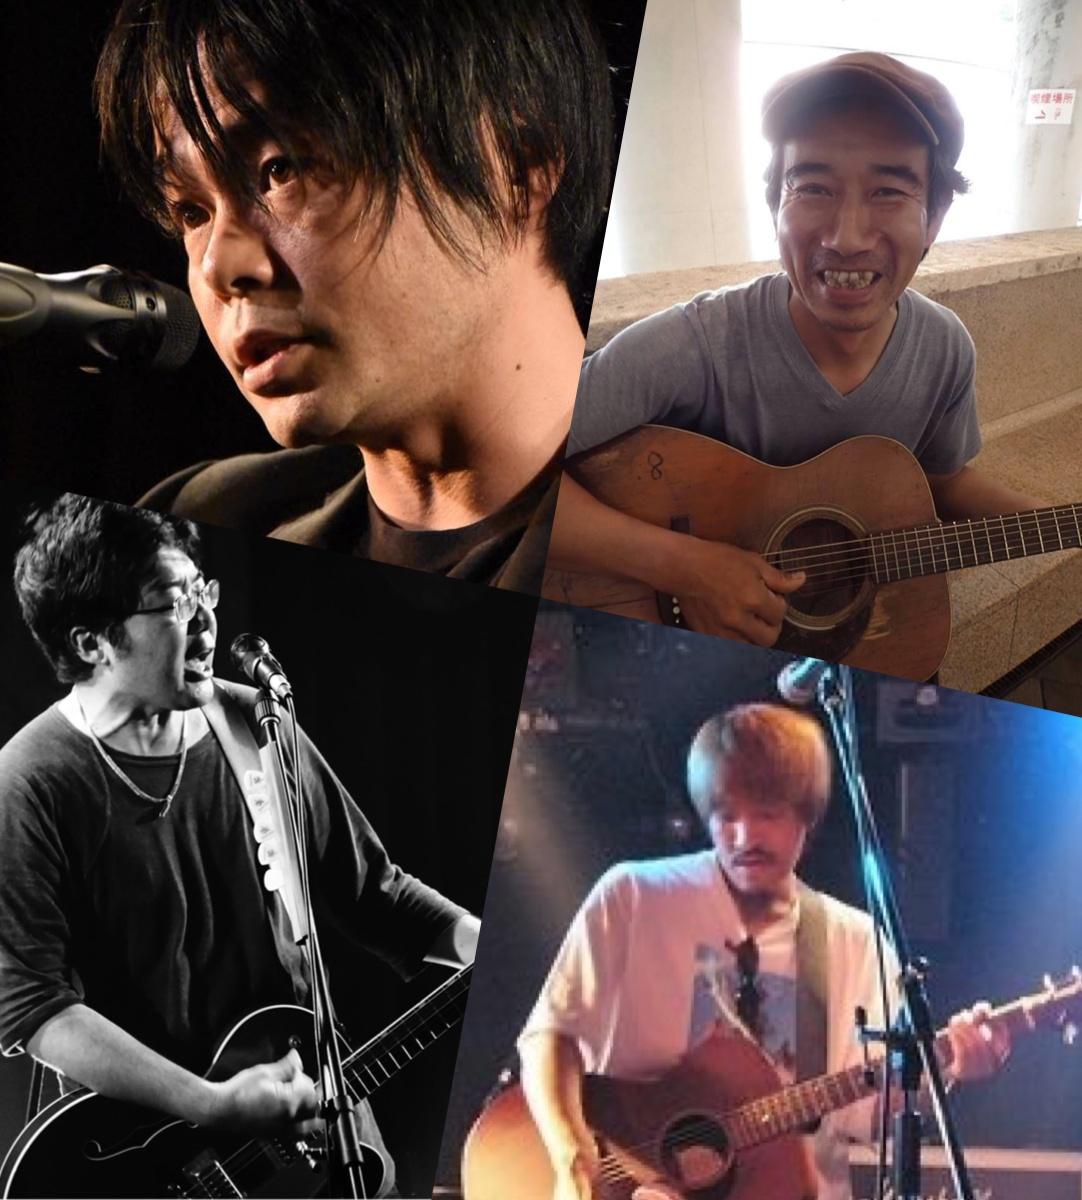 『SUMMERTIME BLUES』出演:アベヒロシ / 中馬晋 / イシガミシンタロウ / たけぽん